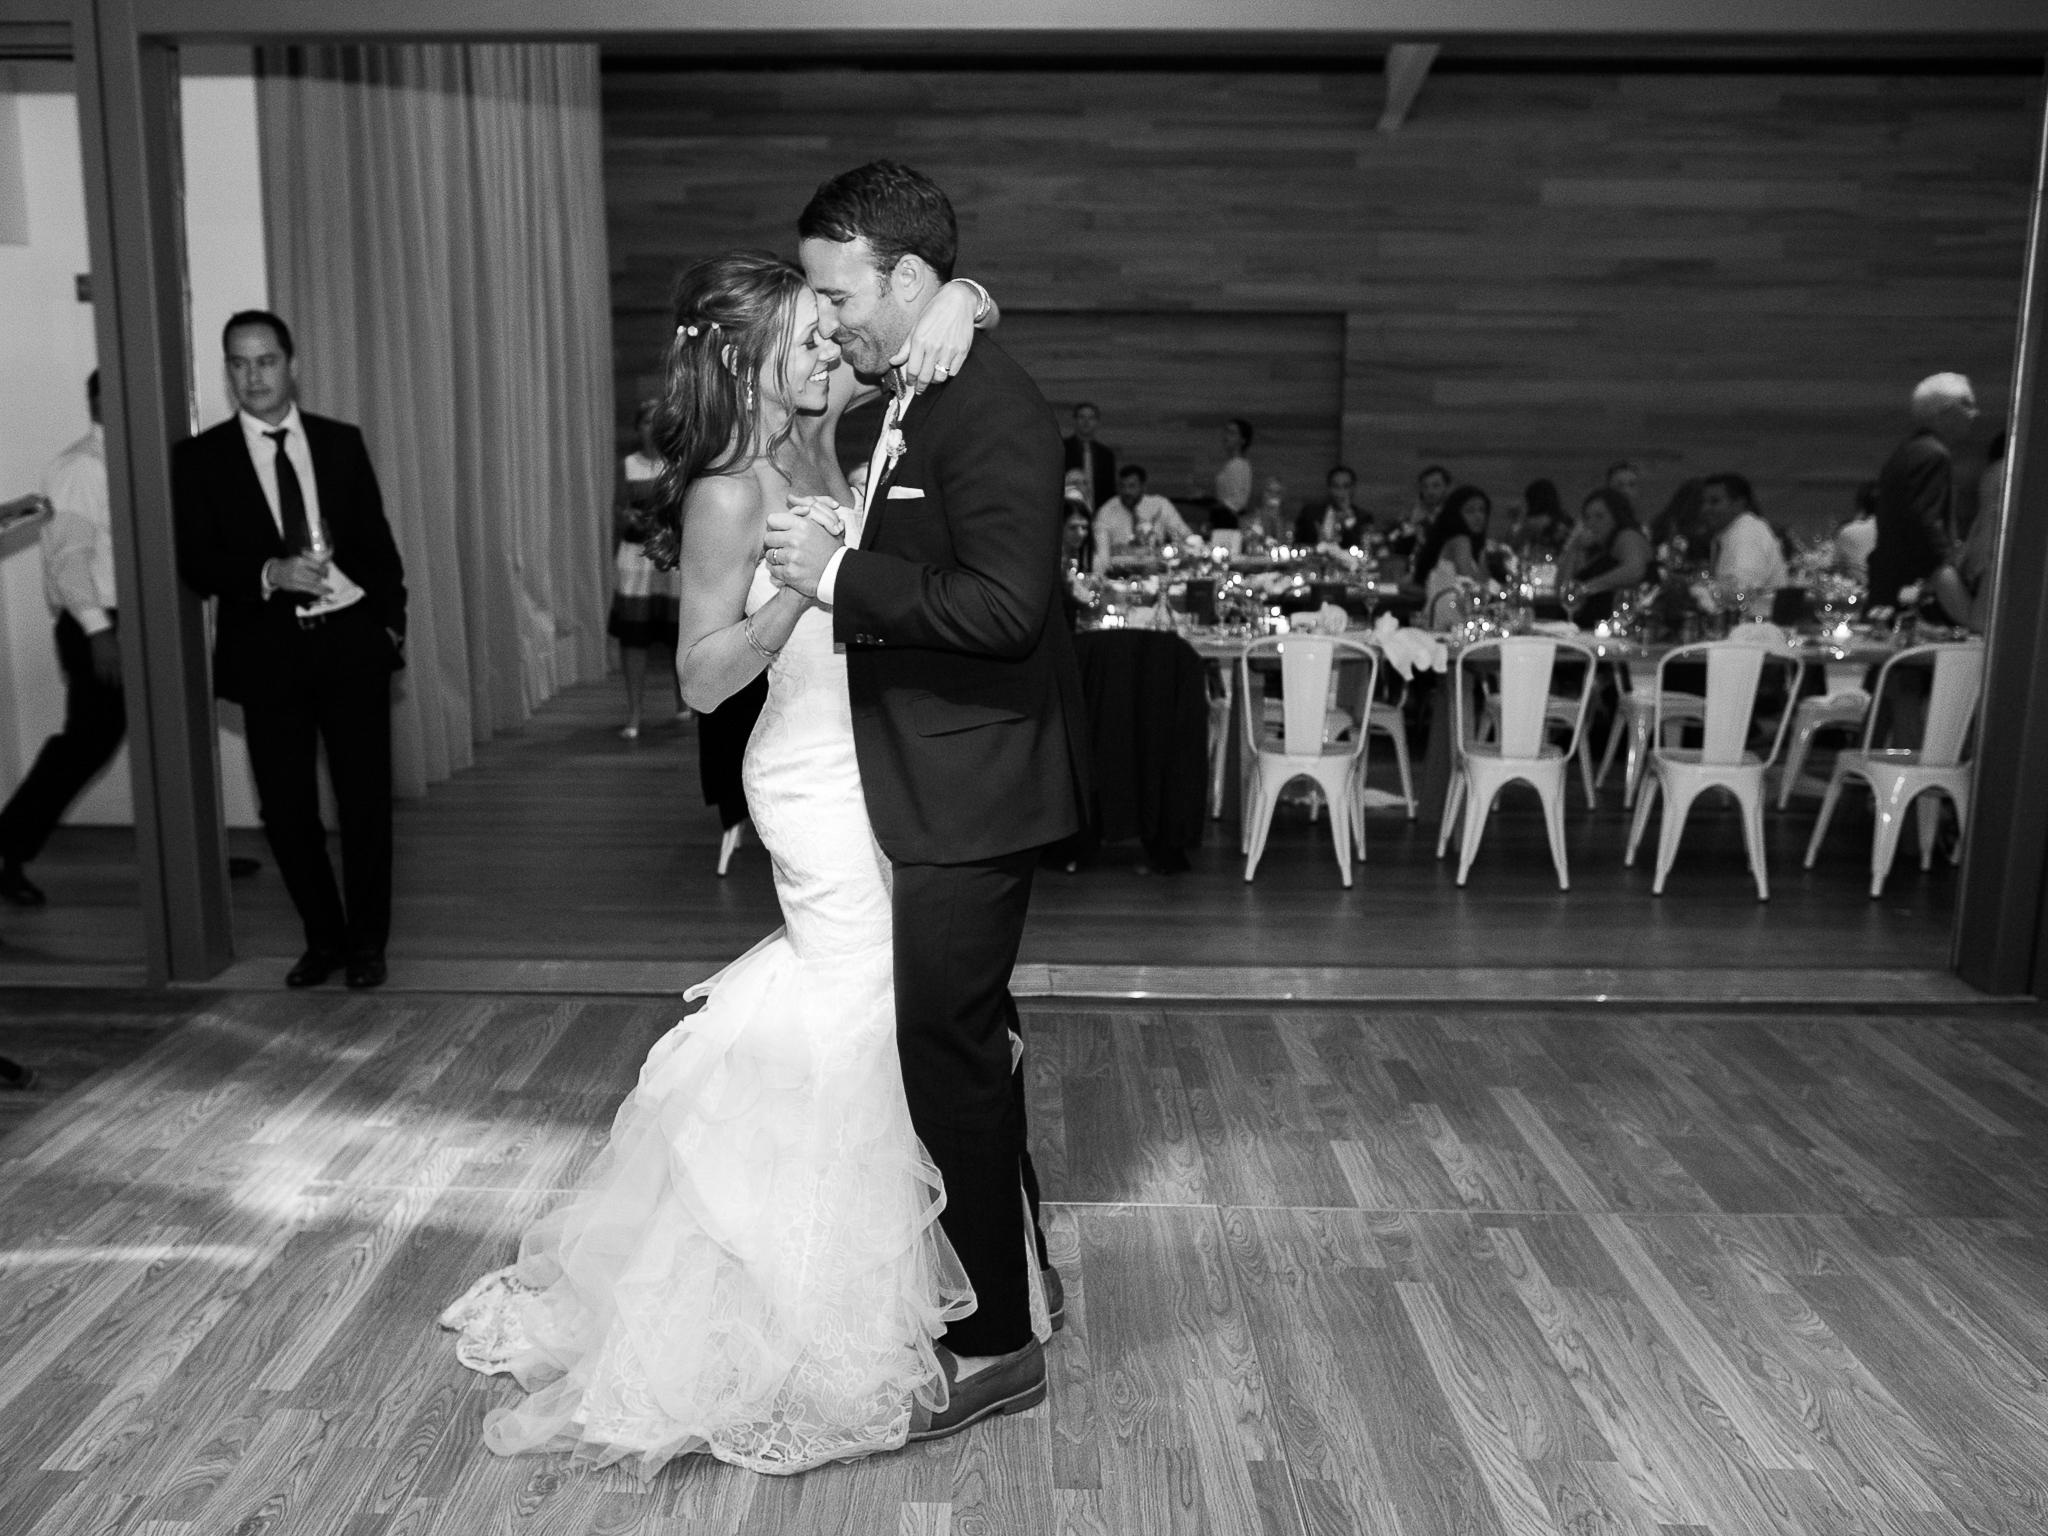 Meghan Mehan Photography - Fine Art Film Wedding Photography - San Francisco   Napa   Sonoma   Big Sur   Chicago   Minneapolis   Milwaukee   Lake Geneva   Door County   Wisconsin 086.jpg